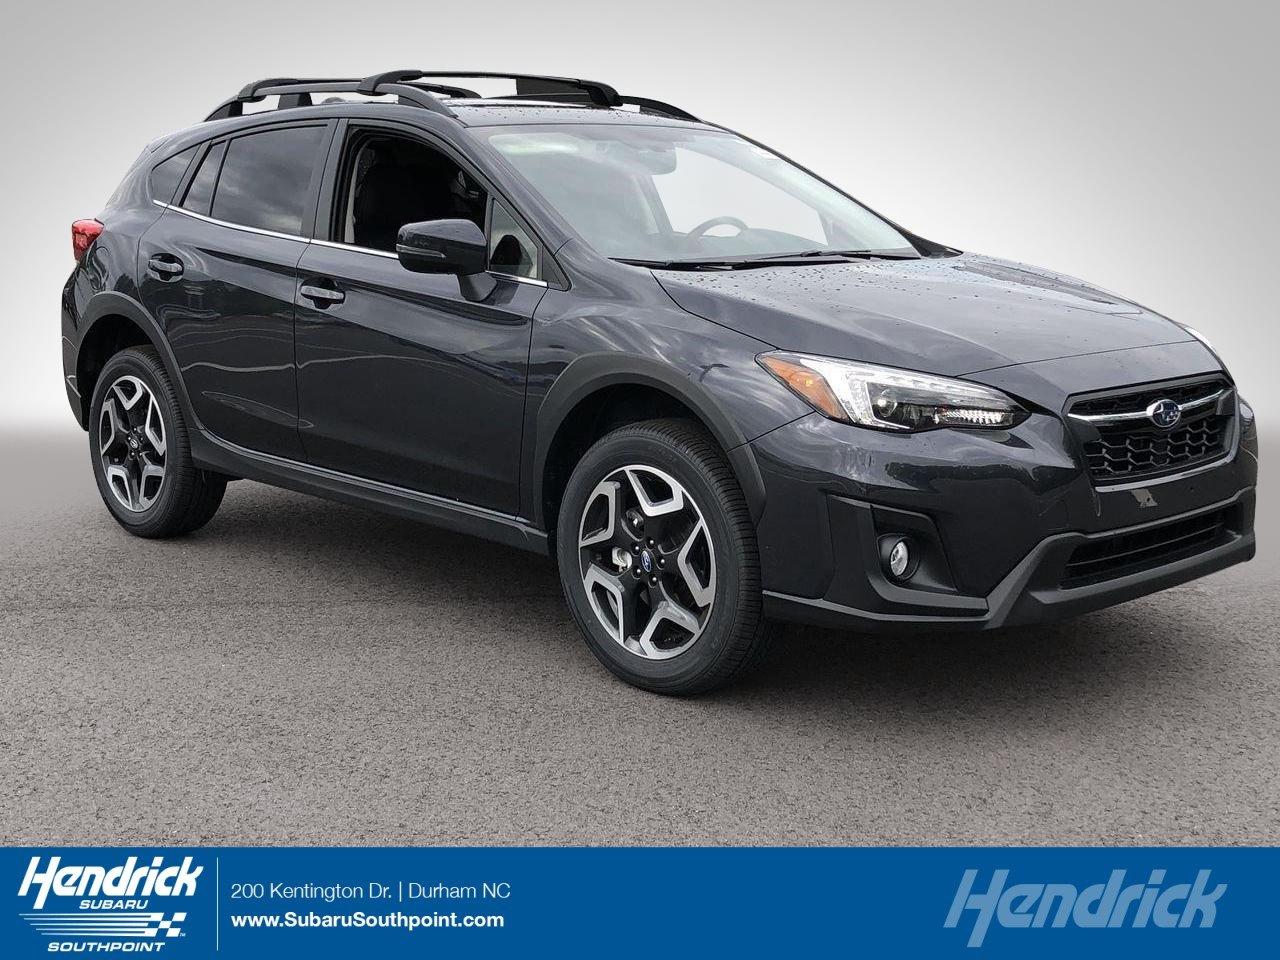 2019 Subaru Crosstrek near Durham - Raleigh | Hendrick Subaru Southpoint